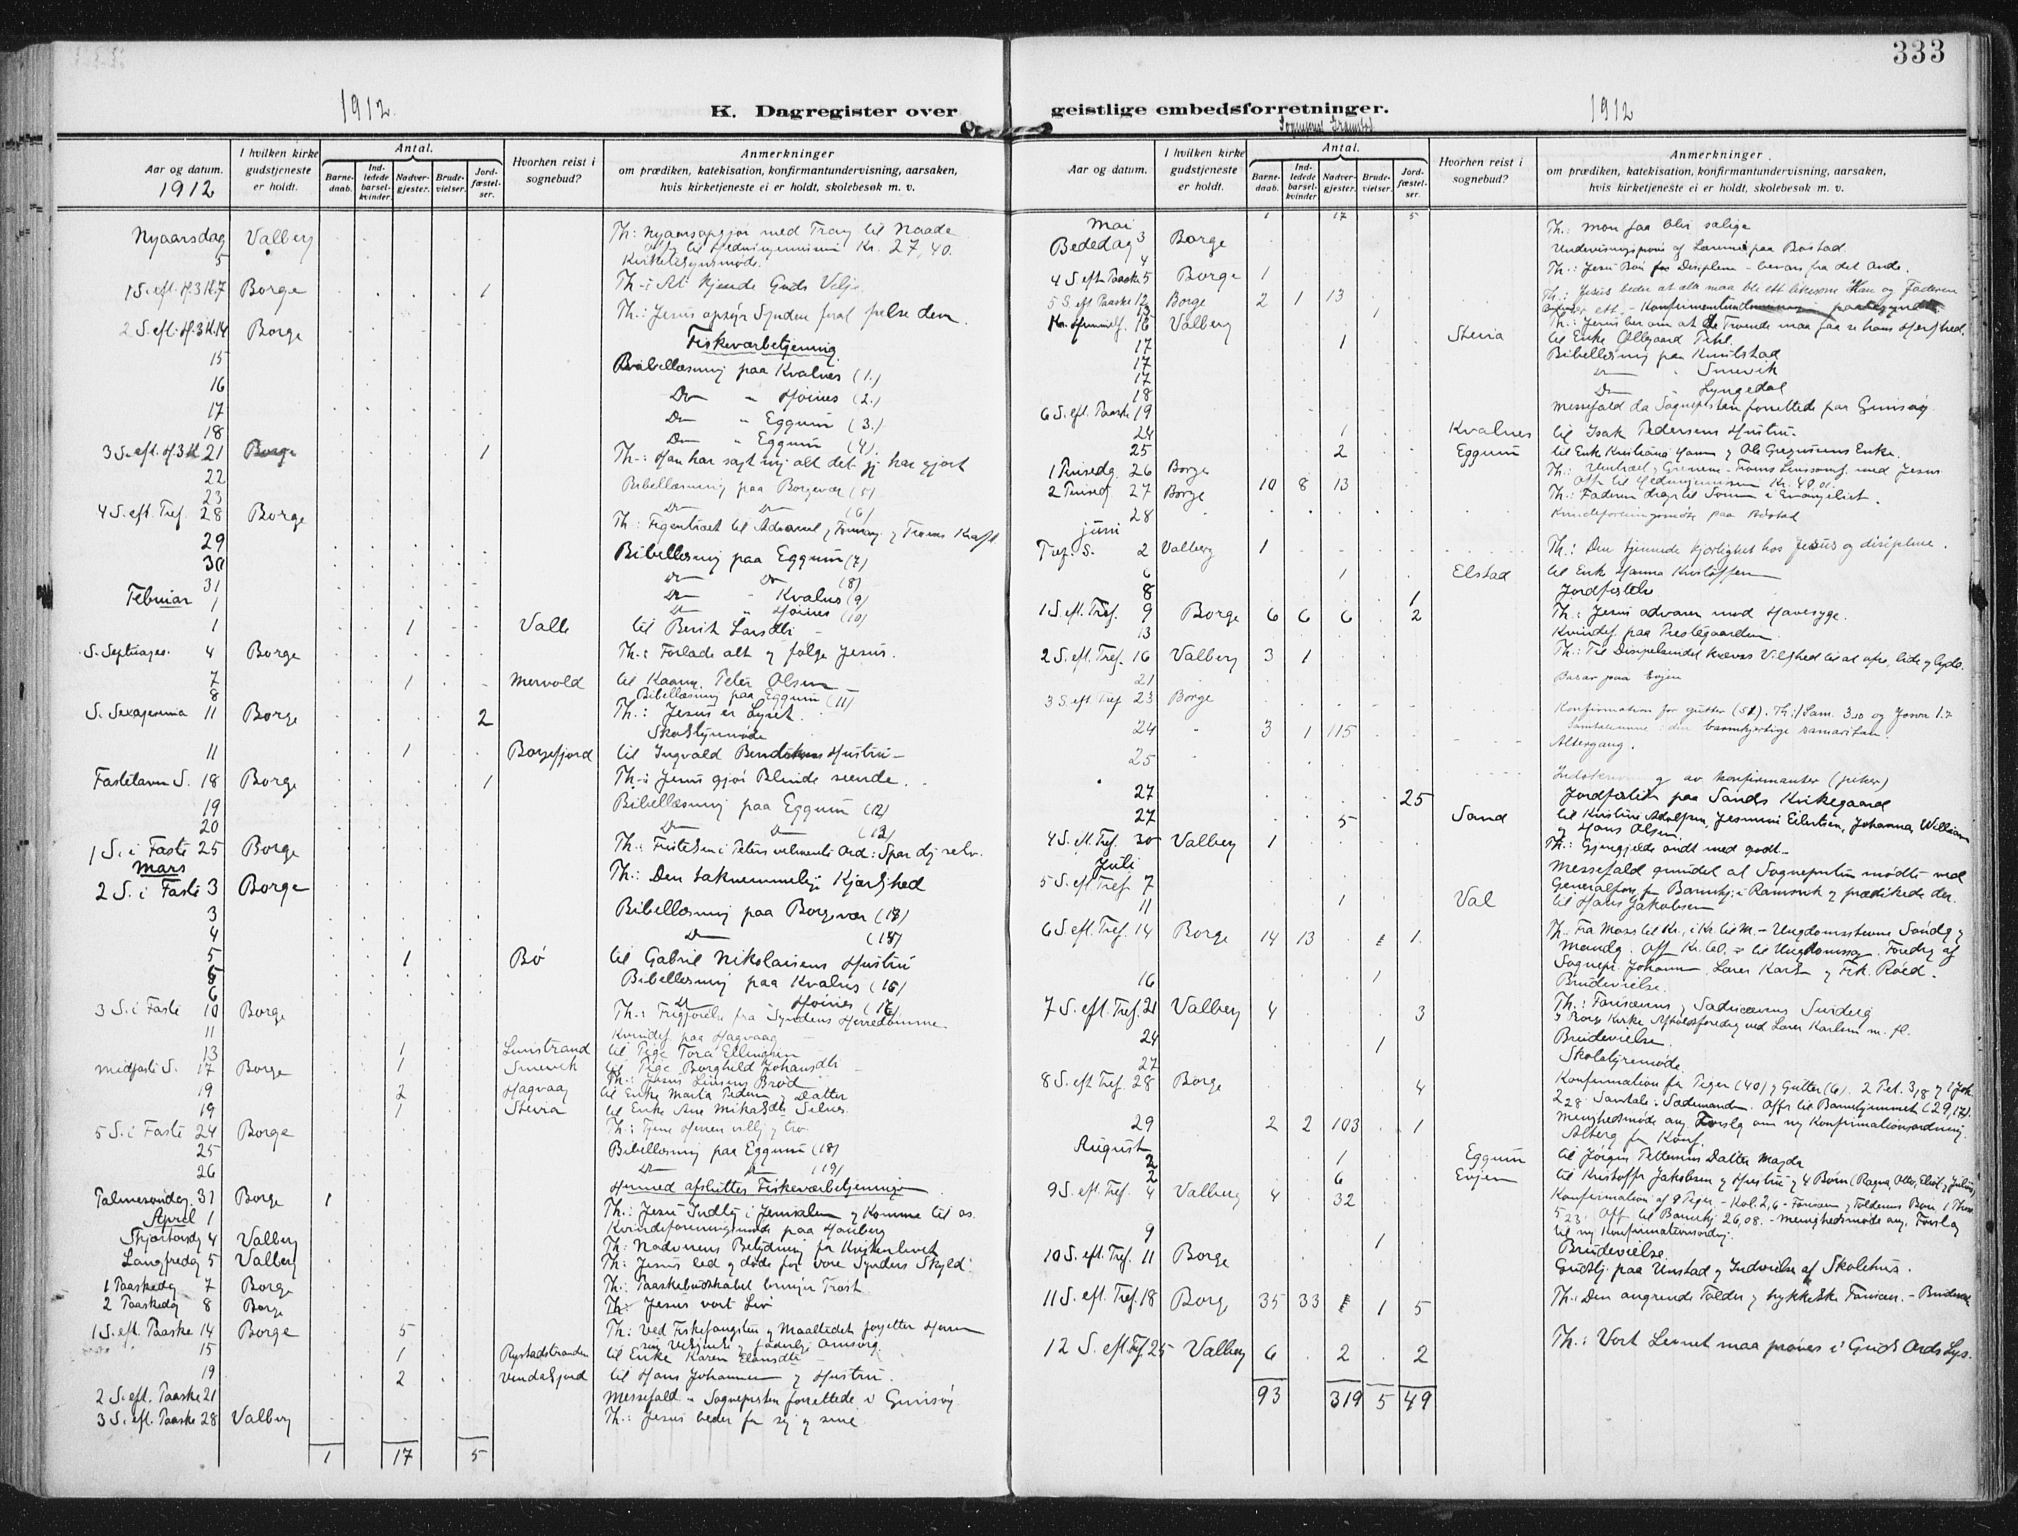 SAT, Ministerialprotokoller, klokkerbøker og fødselsregistre - Nordland, 880/L1135: Ministerialbok nr. 880A09, 1908-1919, s. 333